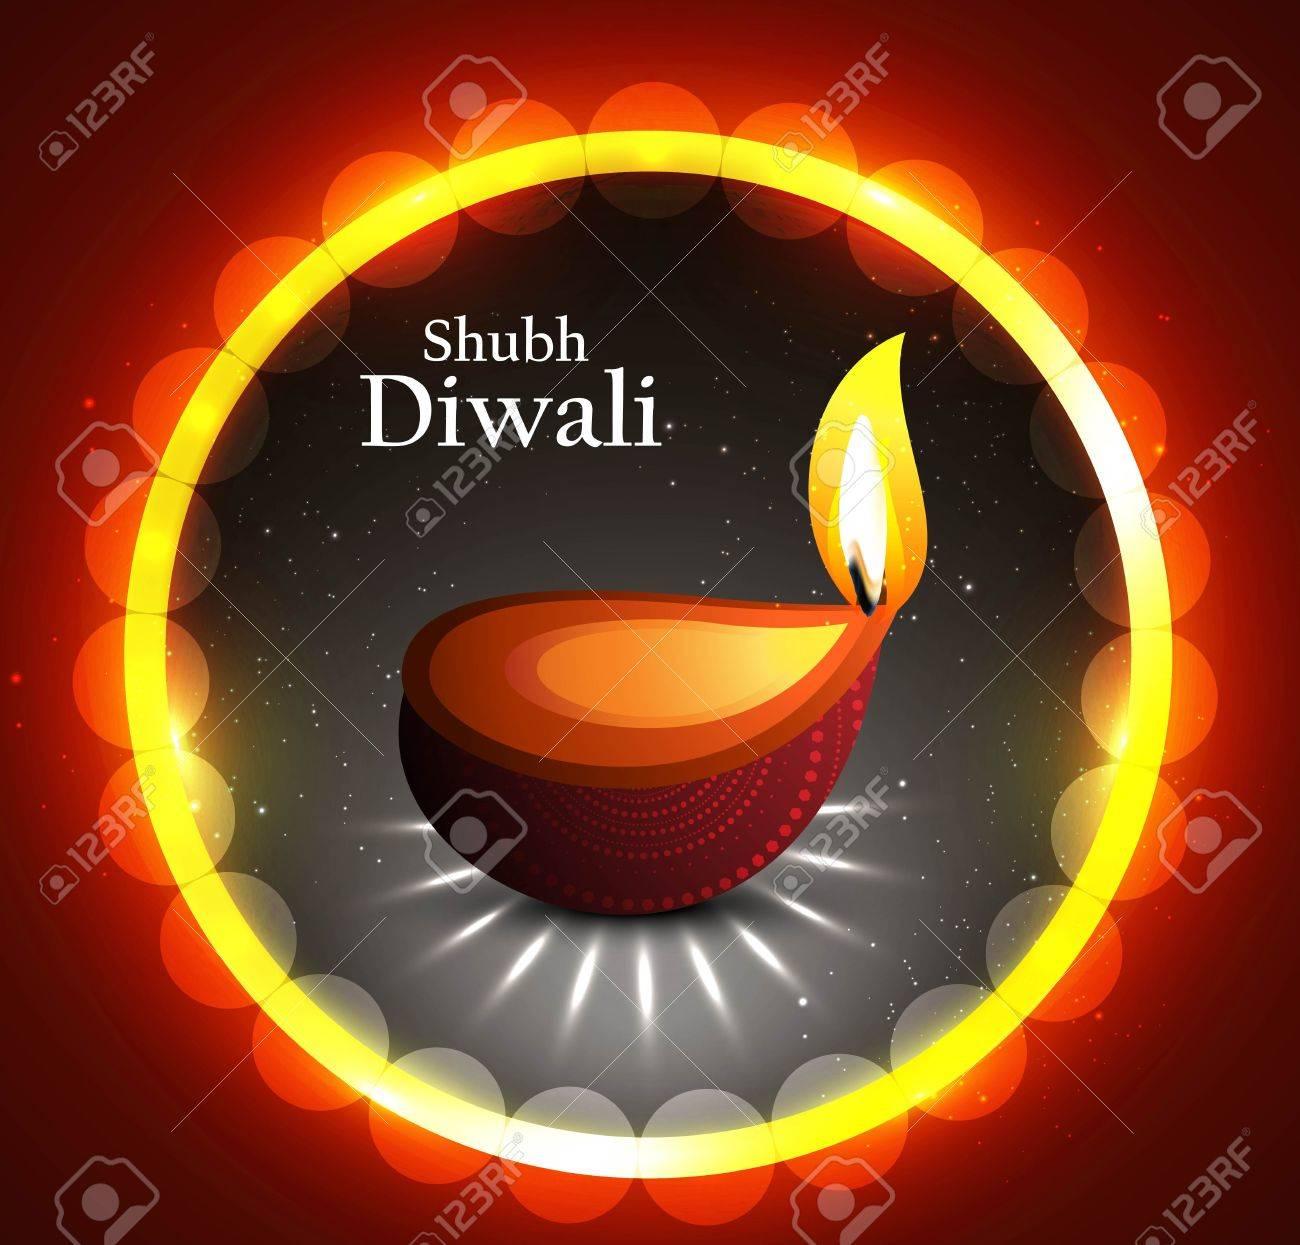 Happy diwali beautiful circle illuminating diya background Stock Vector - 18435890